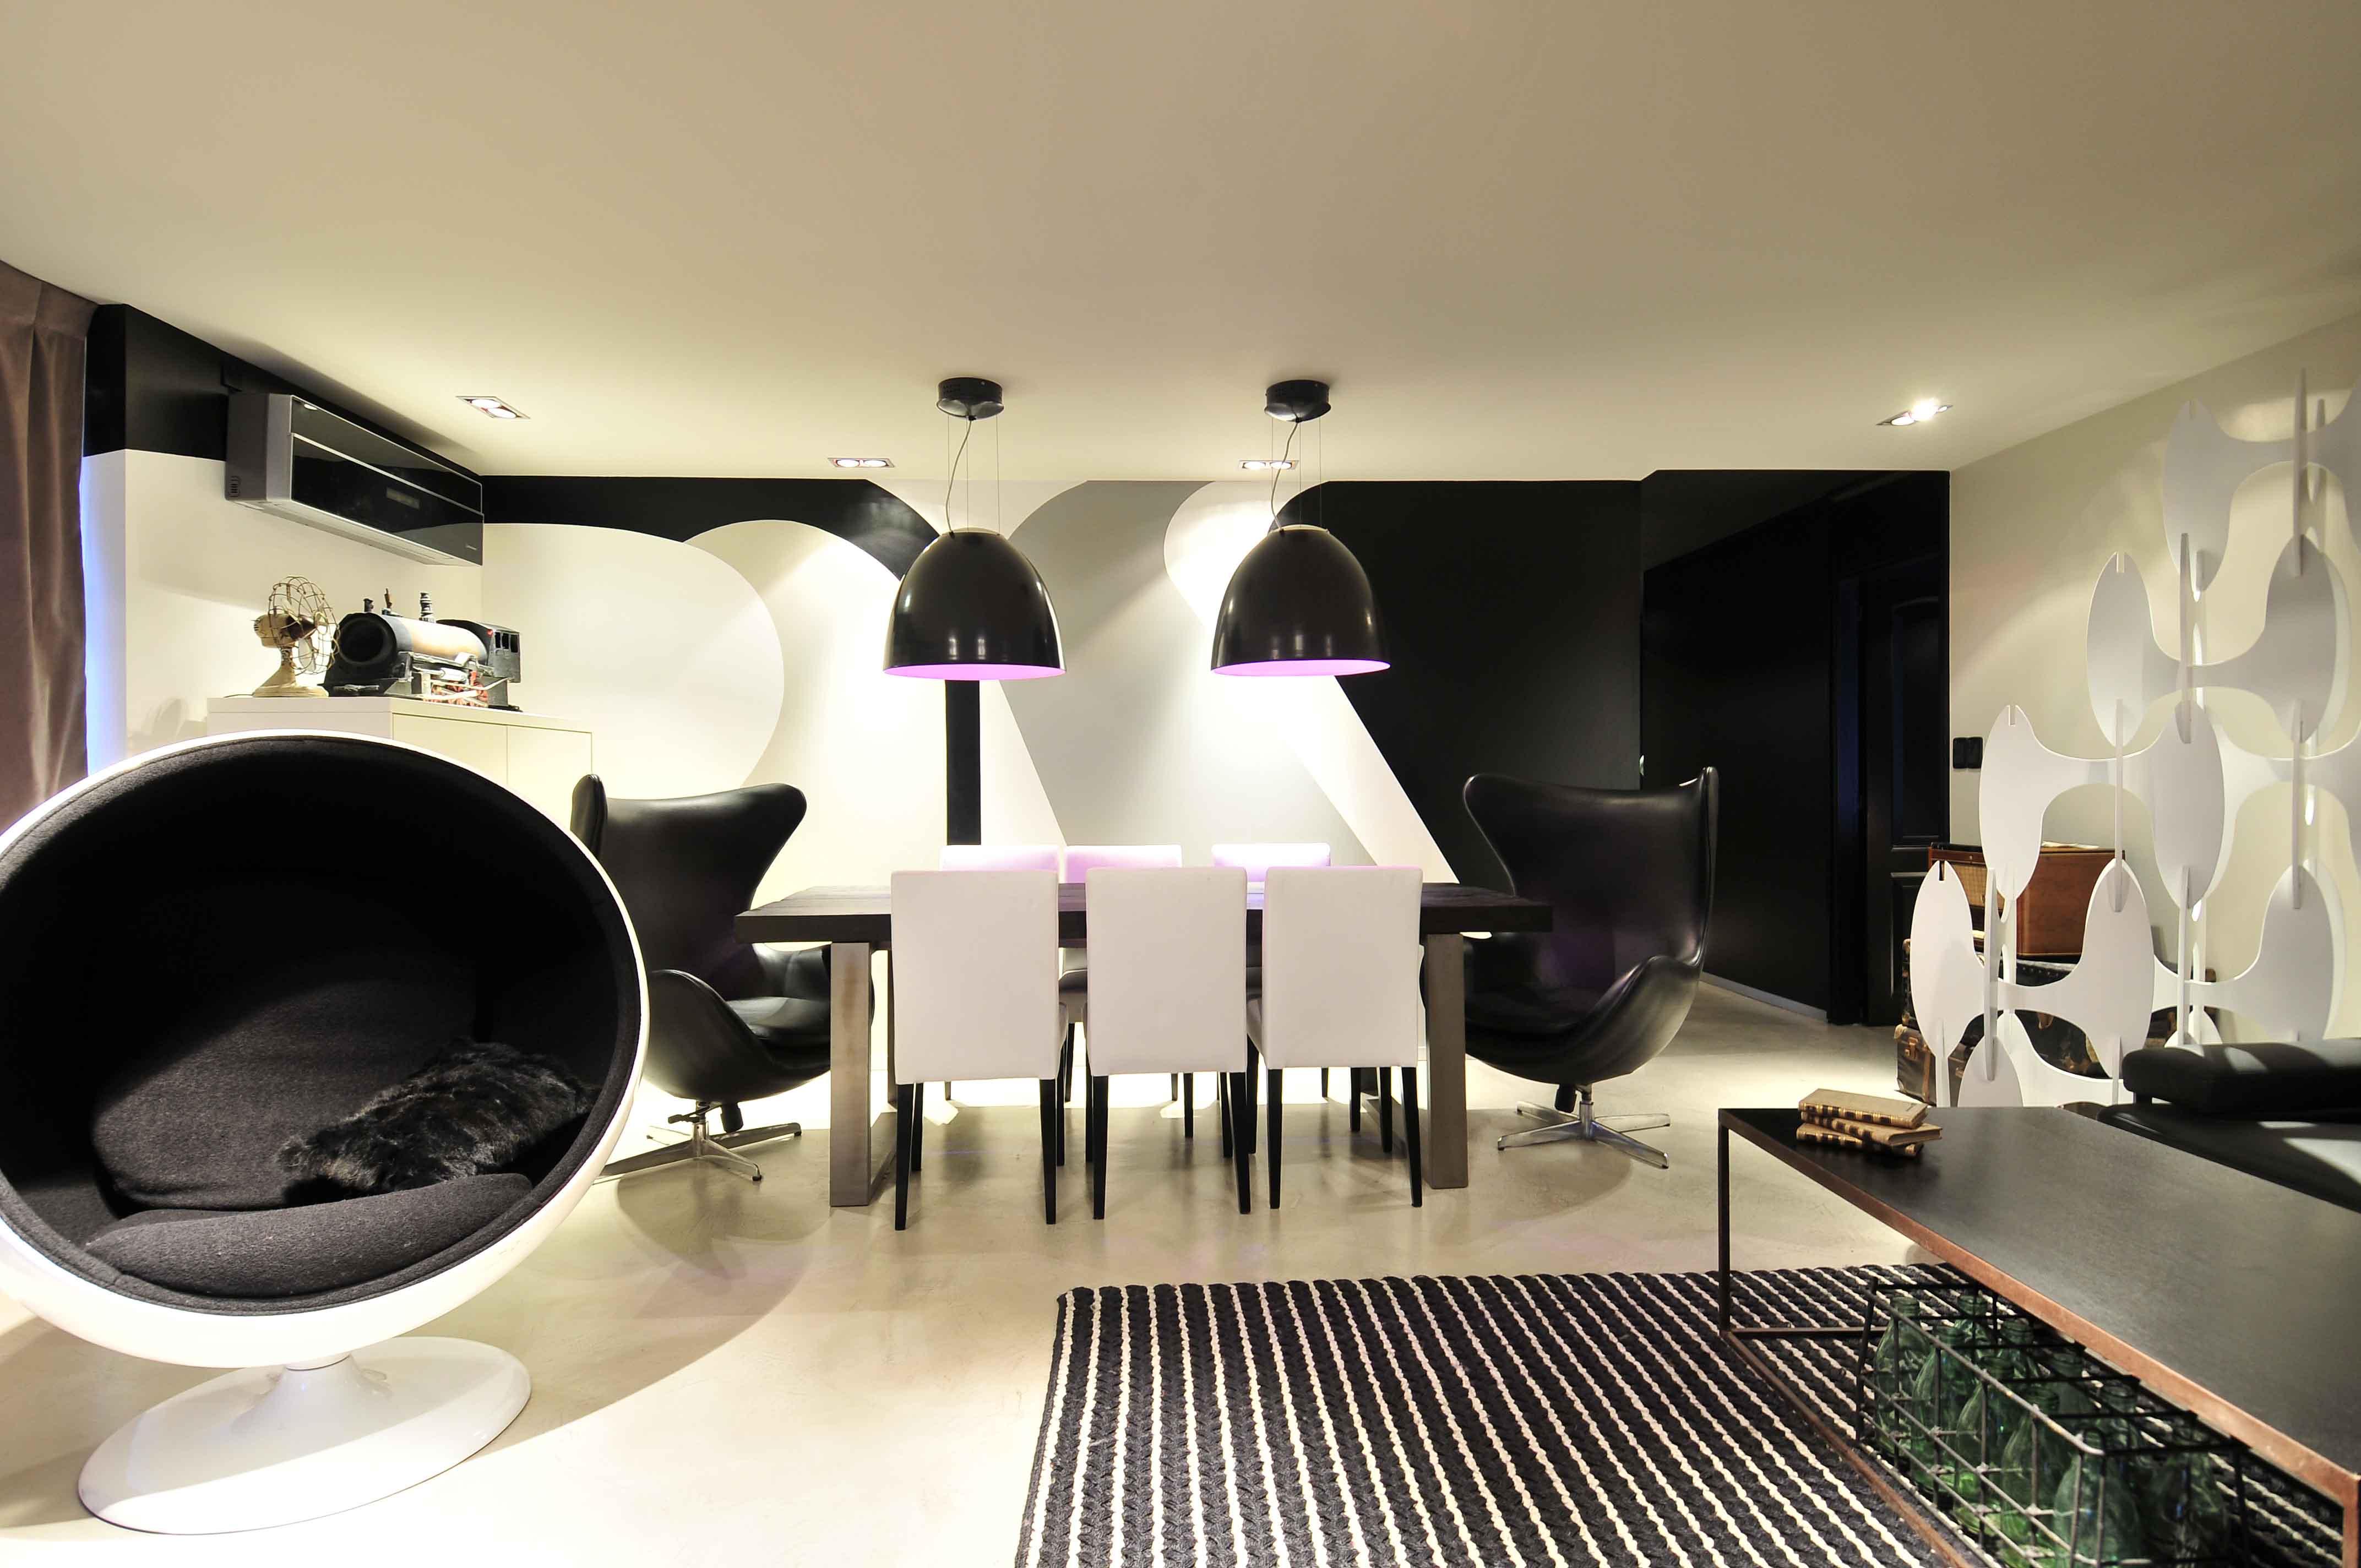 Pin cuadros modernos para car interior design - Cuadros modernos para living ...